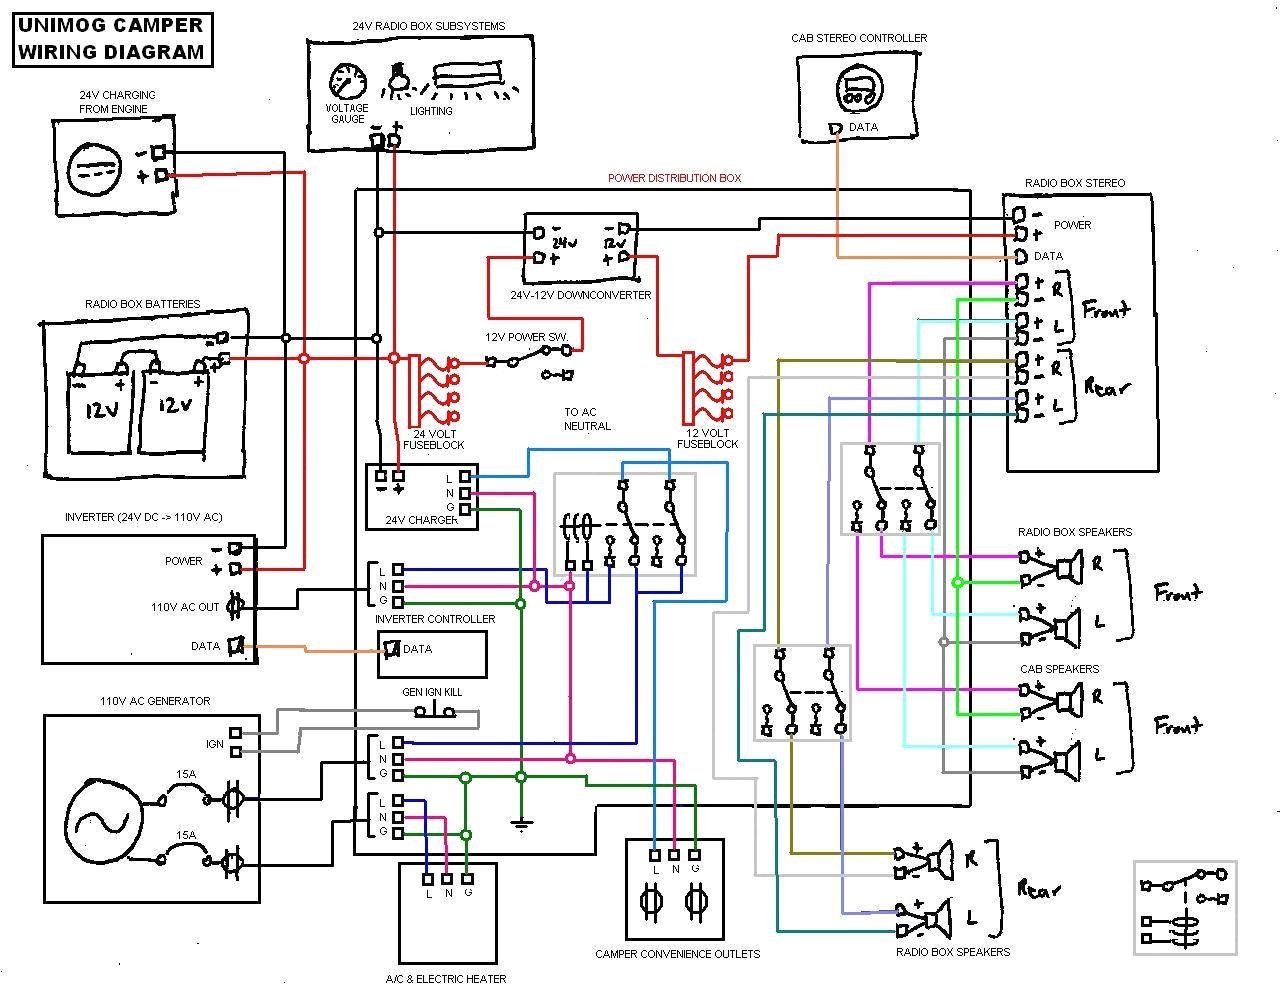 Rv 12V Electrical Wiring Diagram Lights | Wiring Diagram - 12 Volt Wiring Diagram For Lights